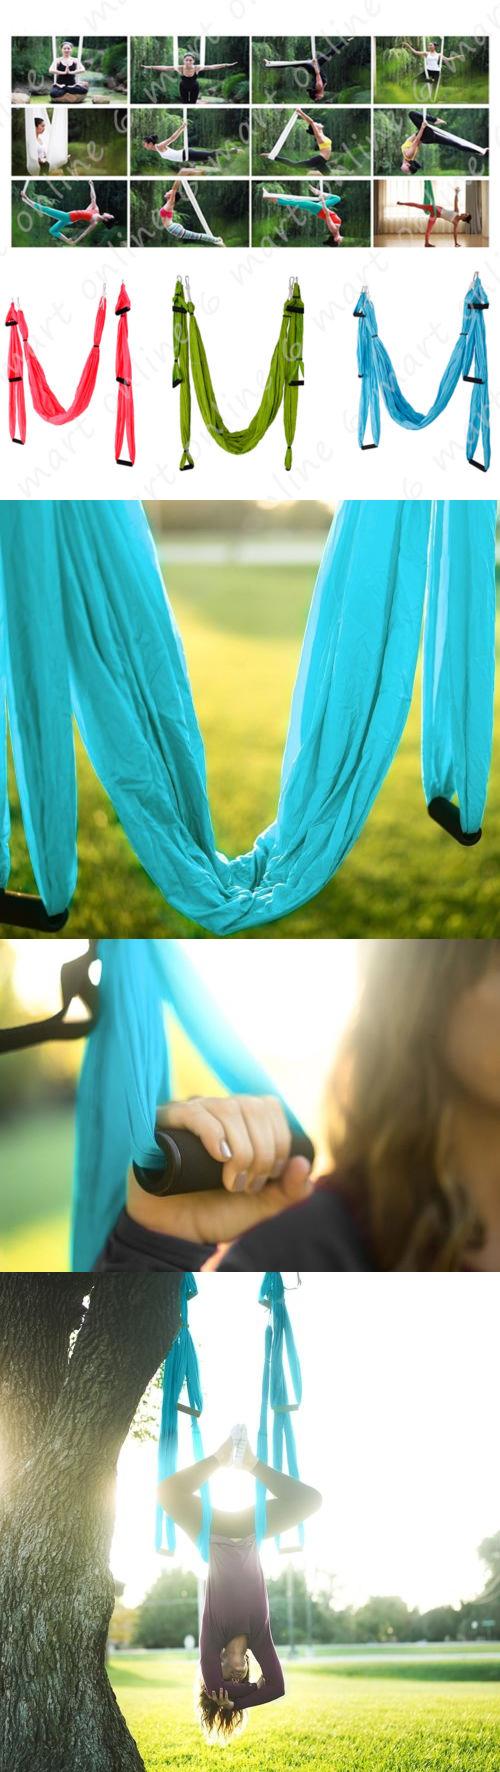 Yoga props anti gravity yoga swing sling hammock trapeze for